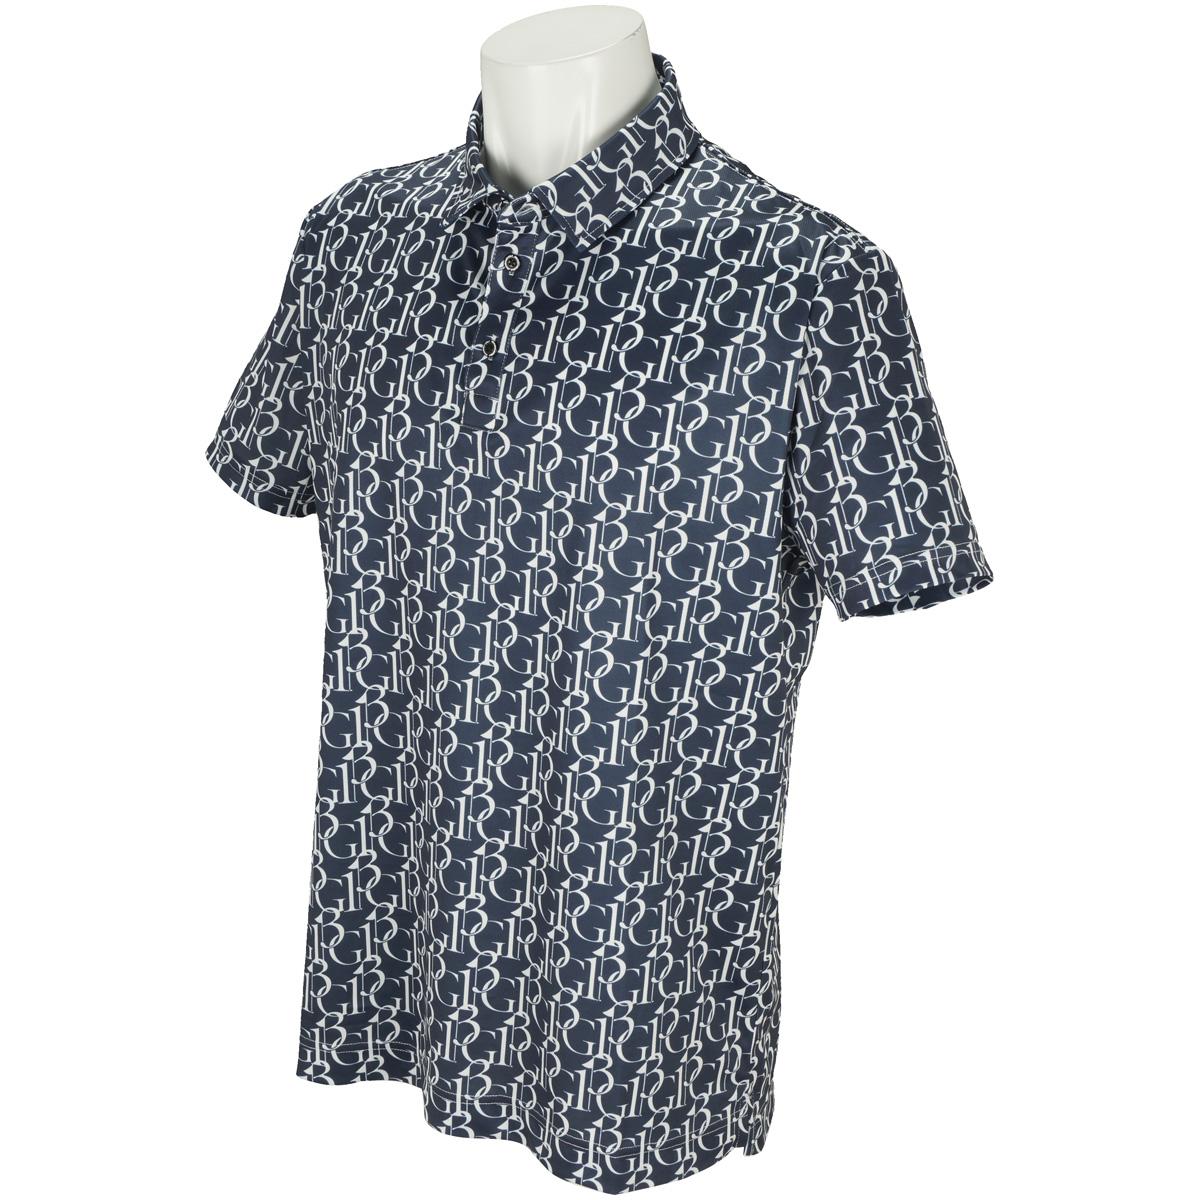 113G 総柄 半袖ポロシャツ